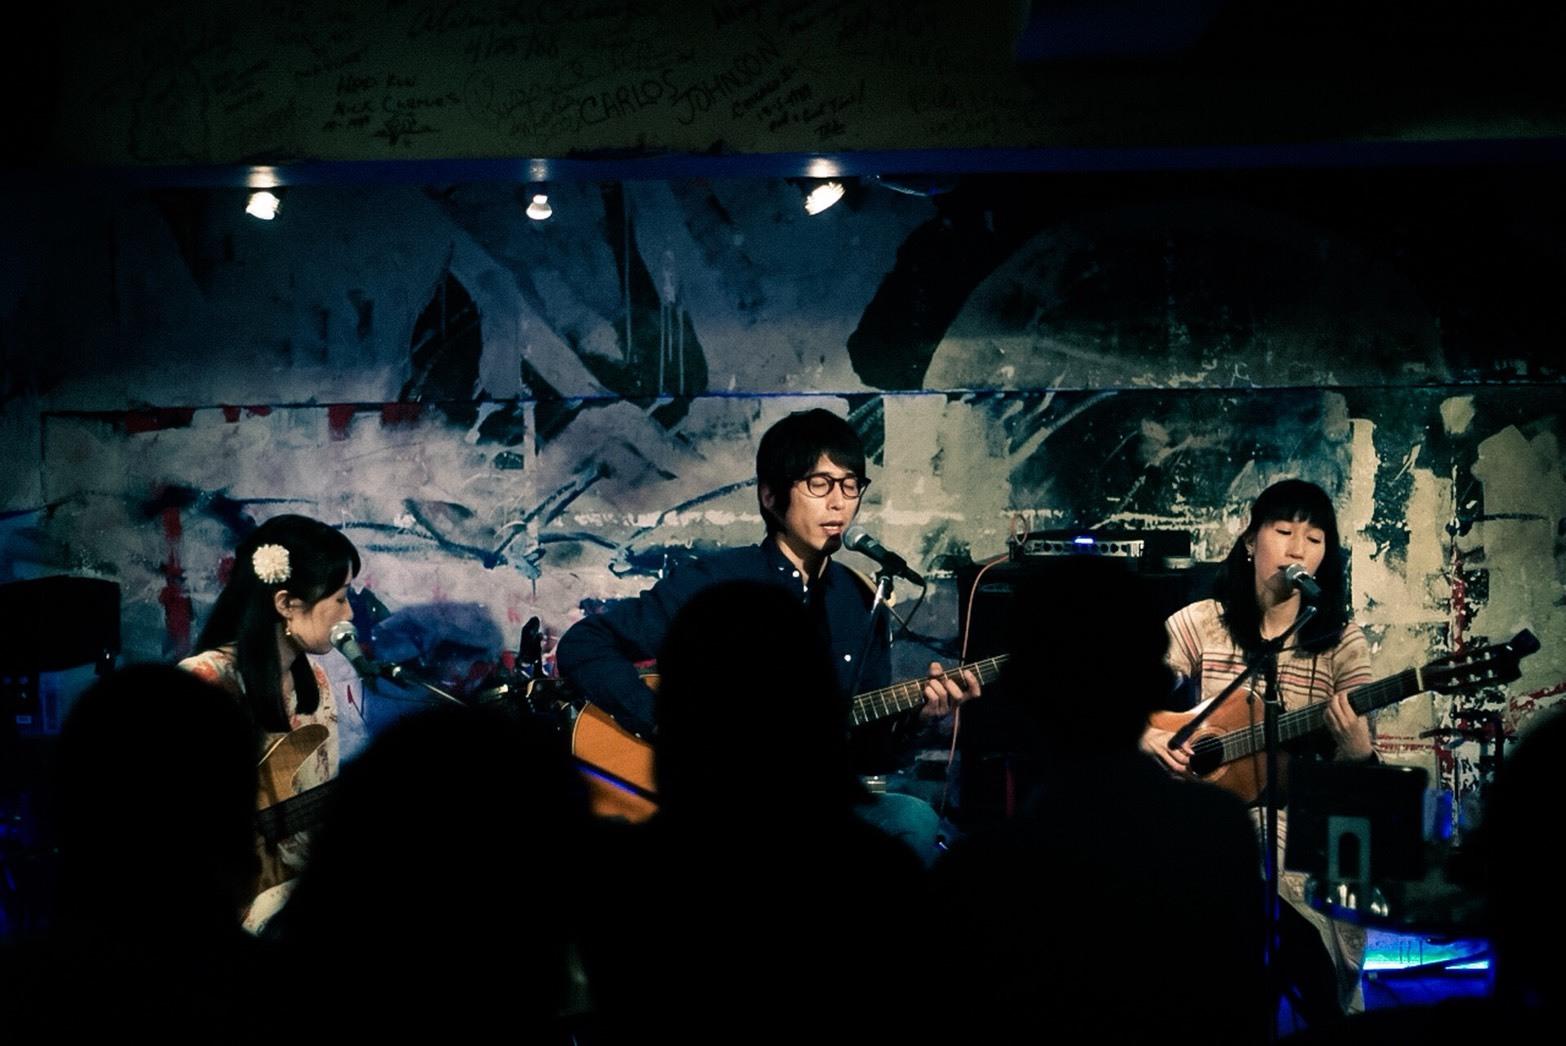 『Floating Strings』リリースライブ、ありがとうございました!_d0110708_10223732.jpg